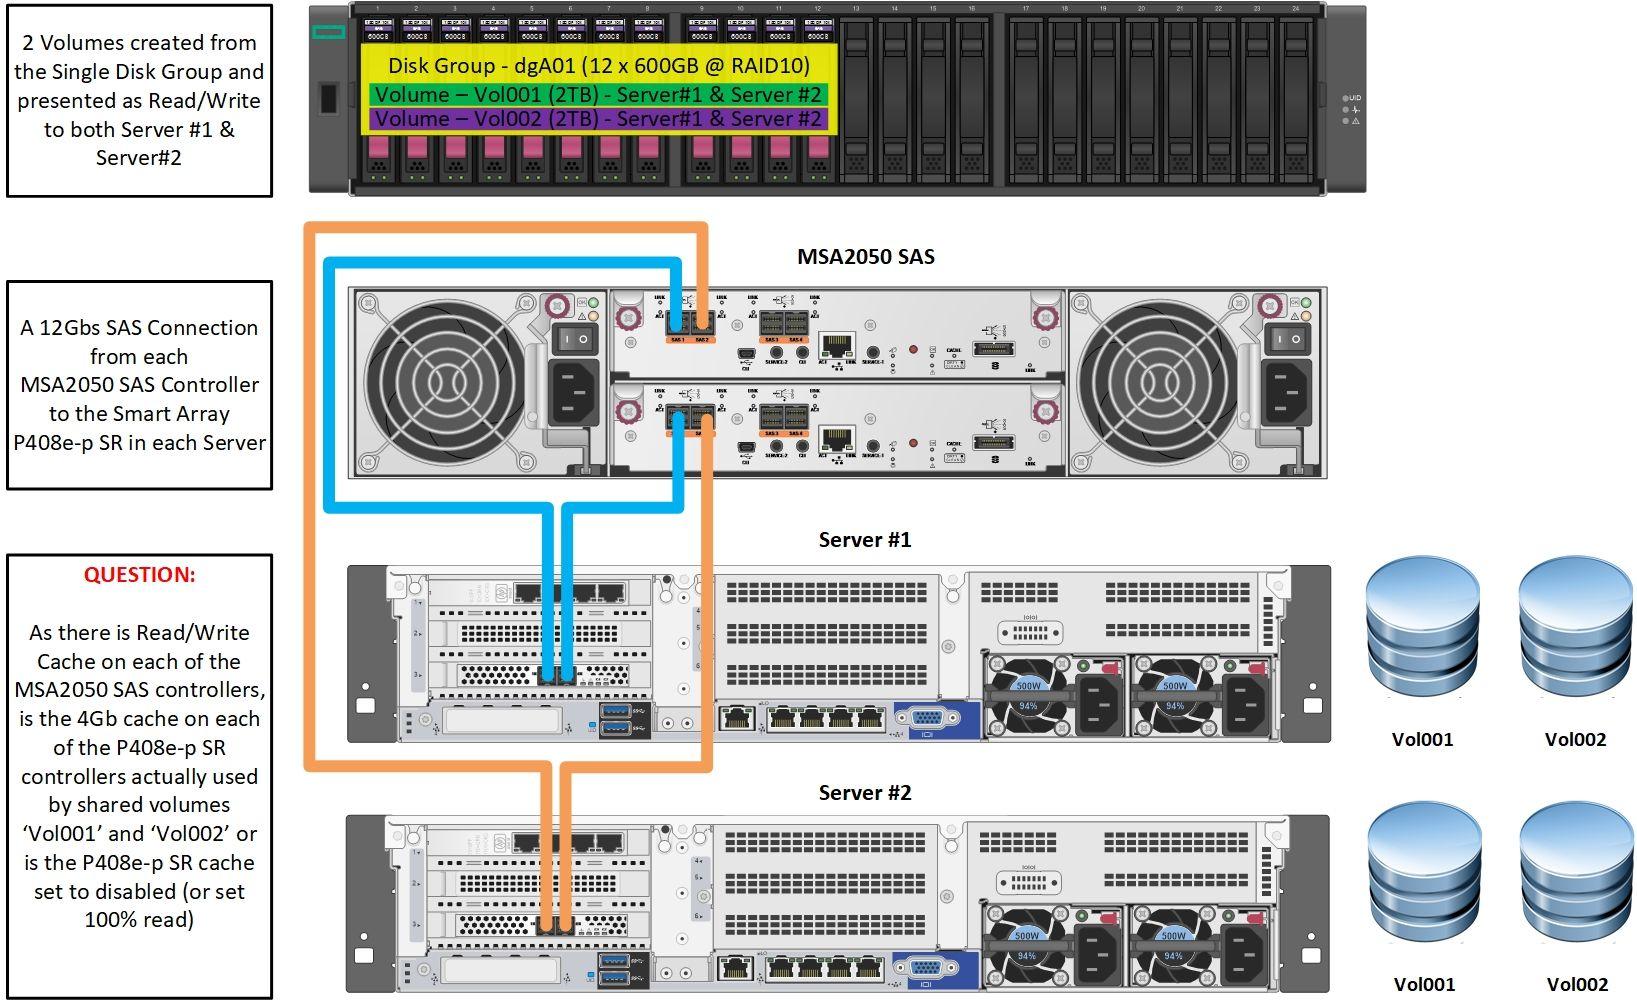 HPE MSA 2050 SAS Diagram.jpg